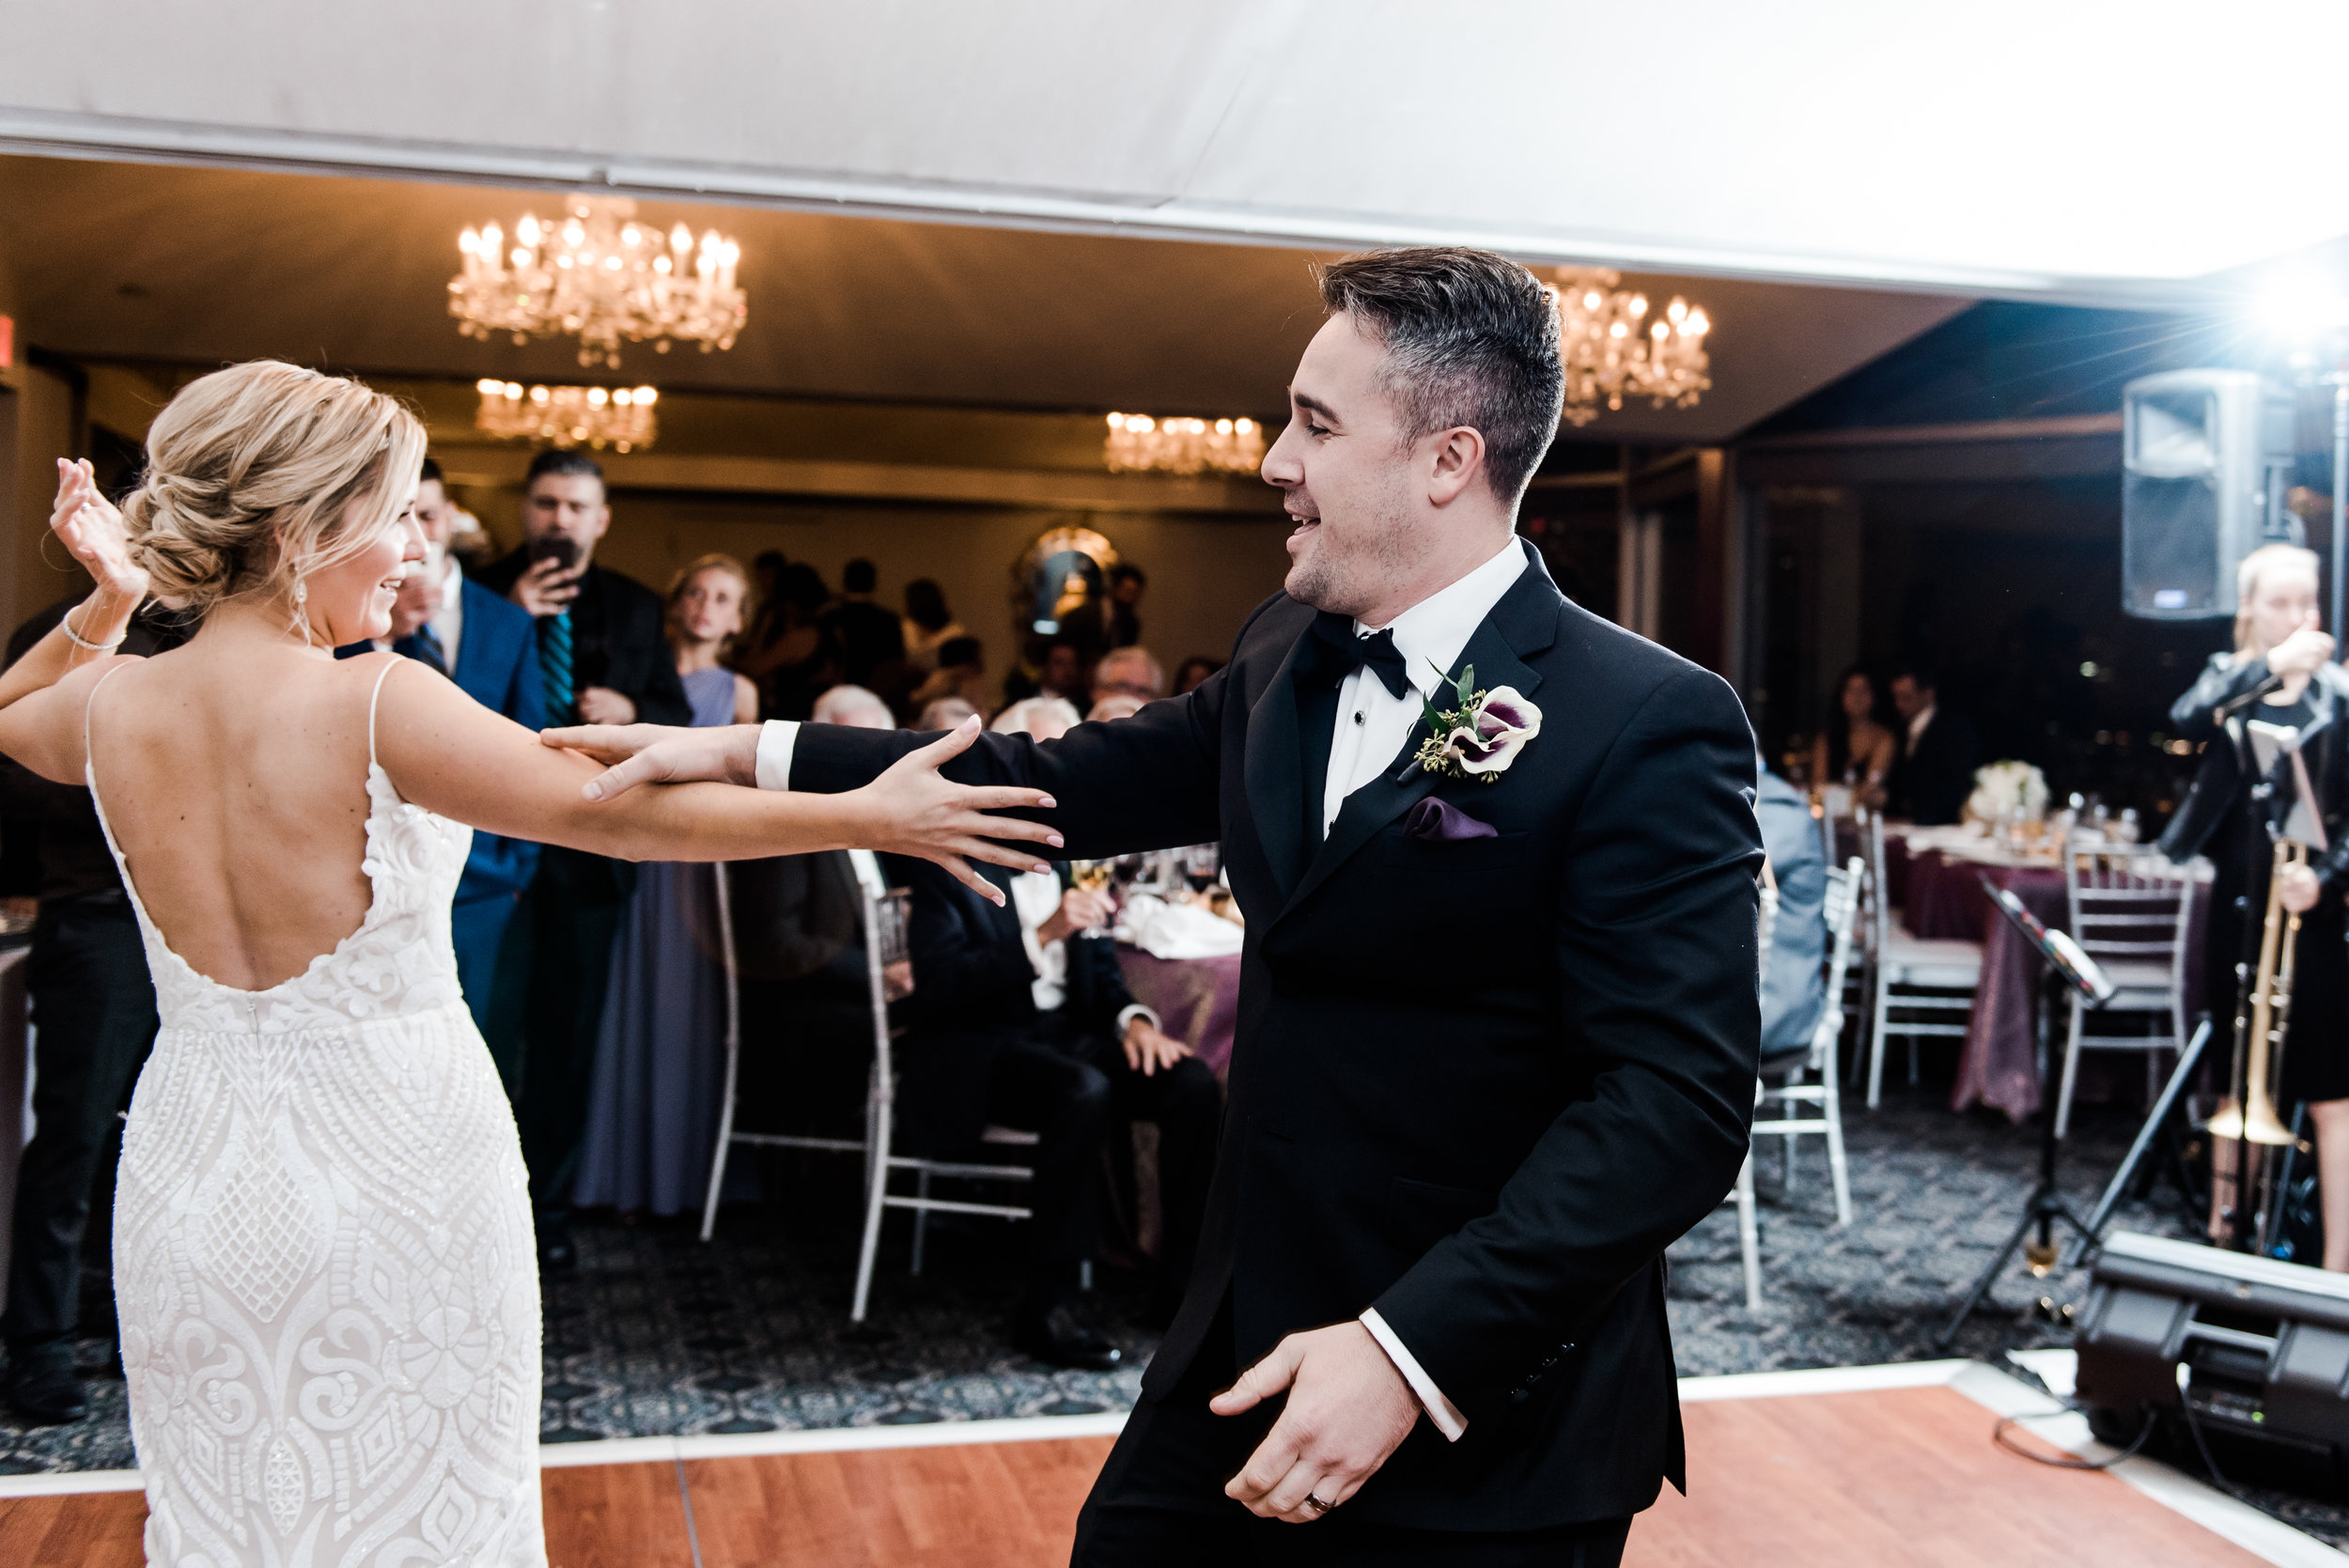 DavidAmandaMundy-Wedding-10282017-KathrynIvyPhotography-563.jpg